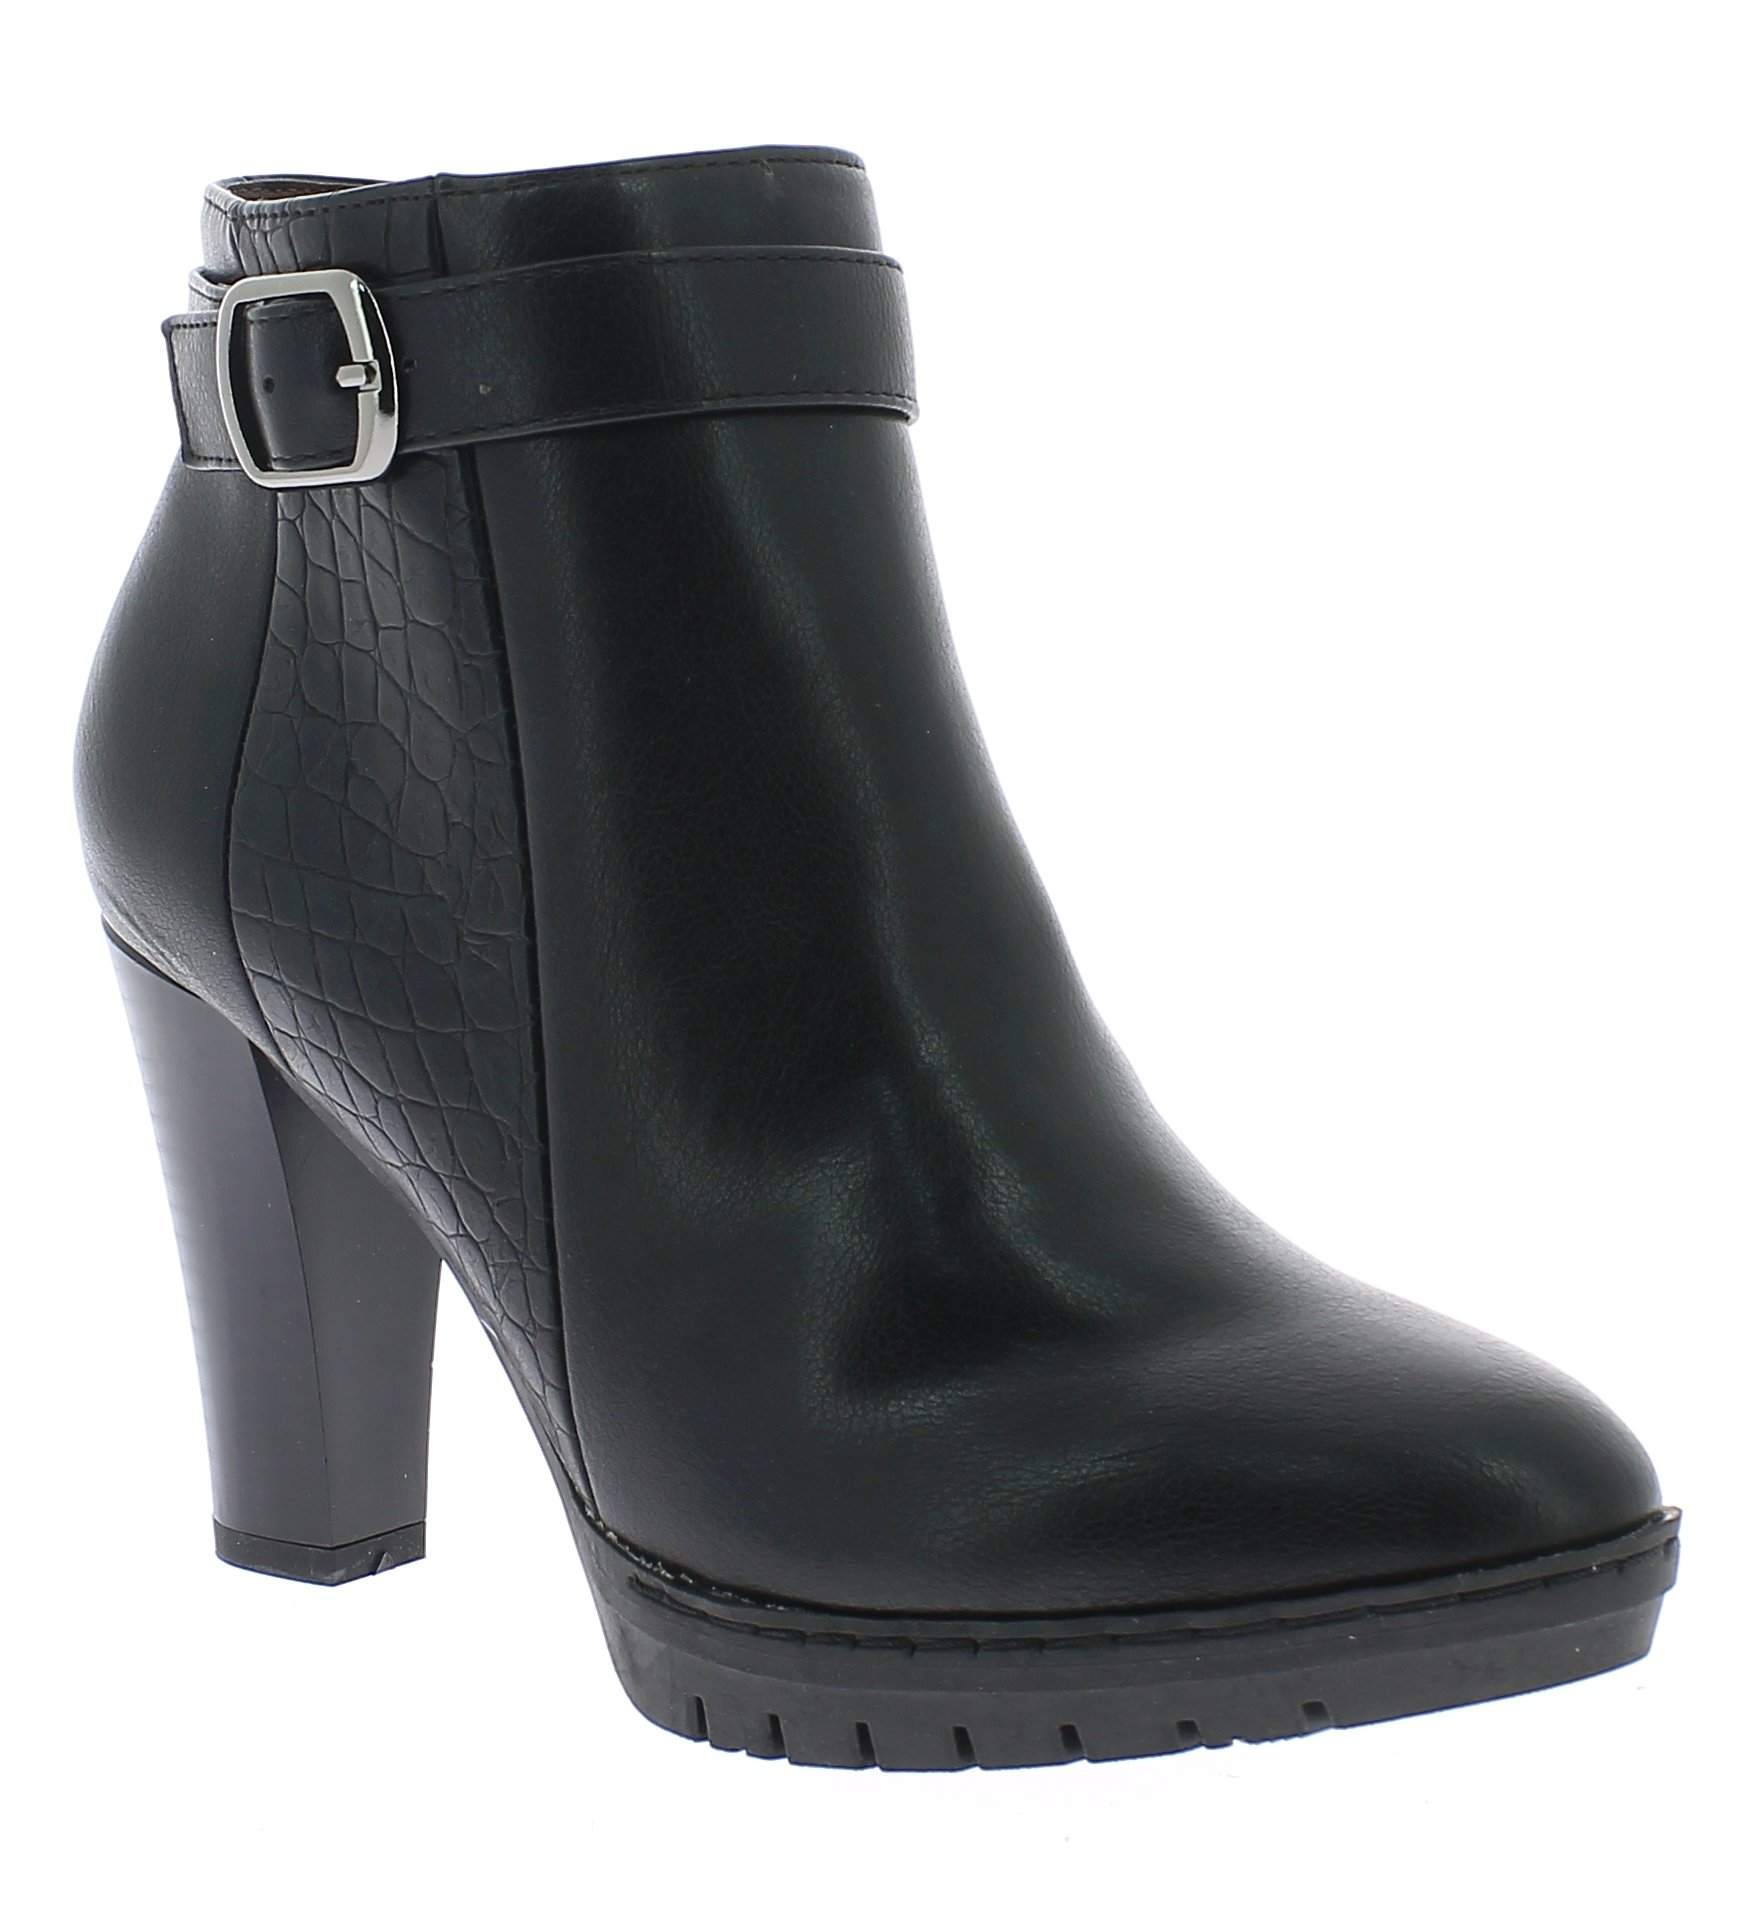 BALLERI Γυναικείο Μποτάκι BL16283 Μαύρο - IqShoes - BL1628-3 BLACK -black-37/1/1 παπούτσια  γυναικεία μποτάκια